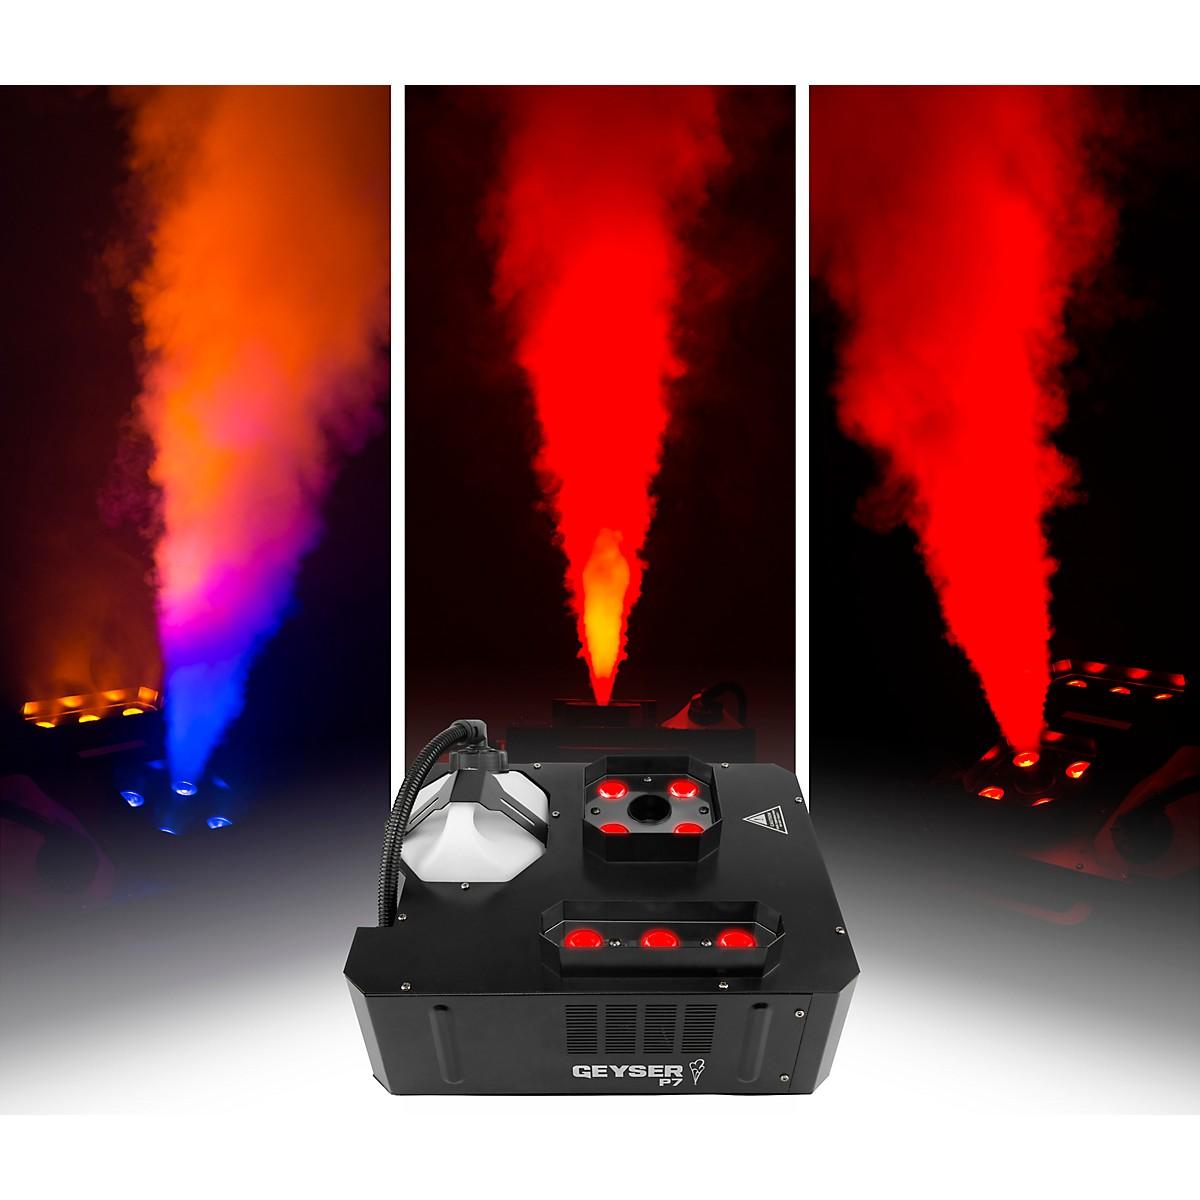 CHAUVET DJ Geyser P7 Compact Fog Machine with RGBA+UV LED and Wireless Remote